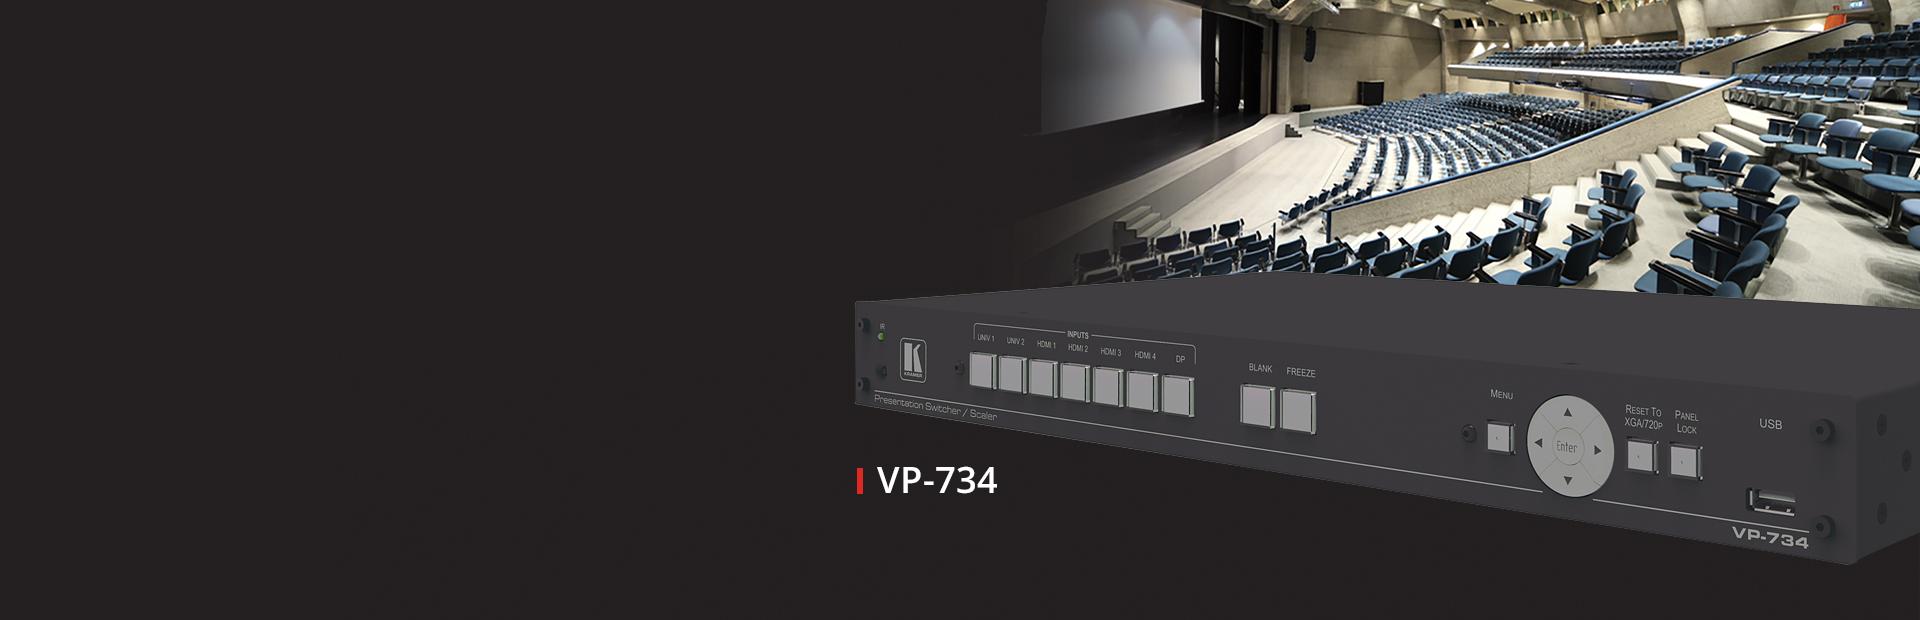 VP-734